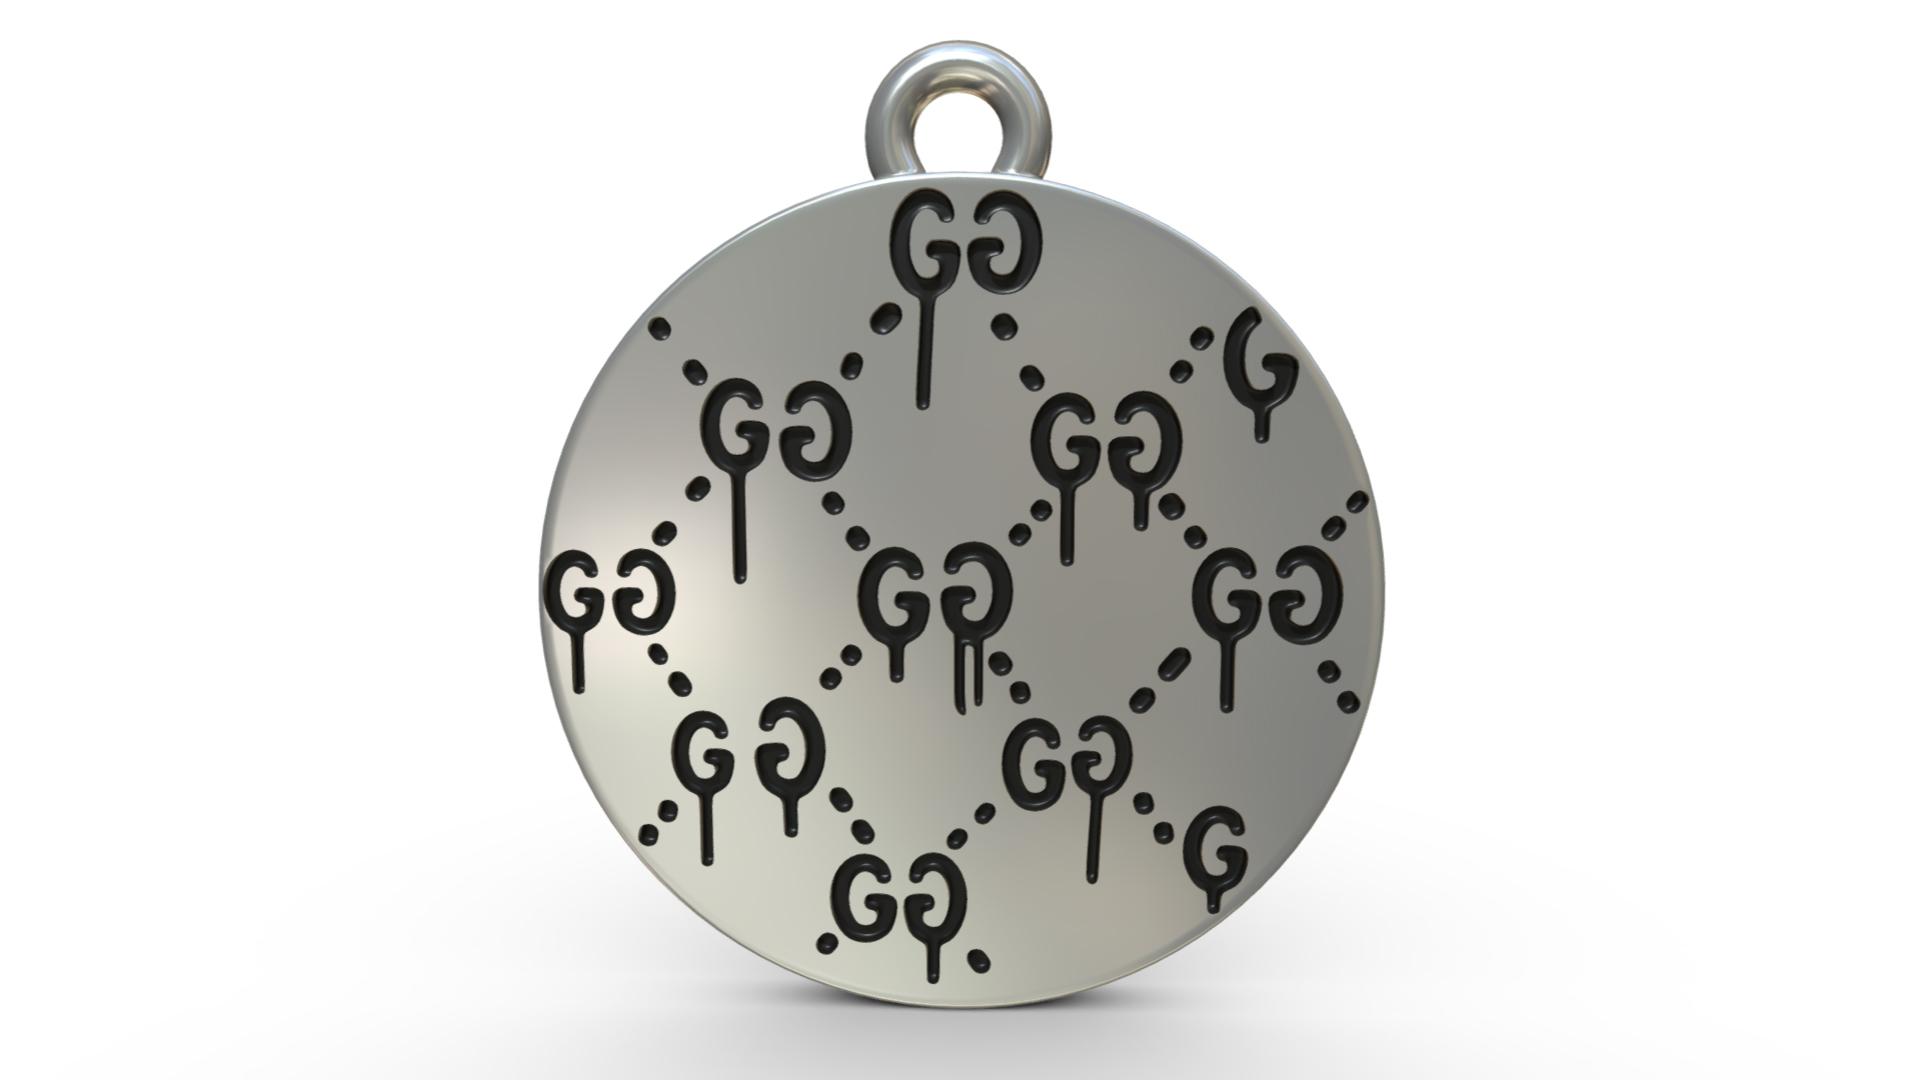 9c51a9f2f Gucci pendant - 3DOcean Item for Sale · 1.jpg 10.jpg 2.jpg 3.jpg 4.jpg ...